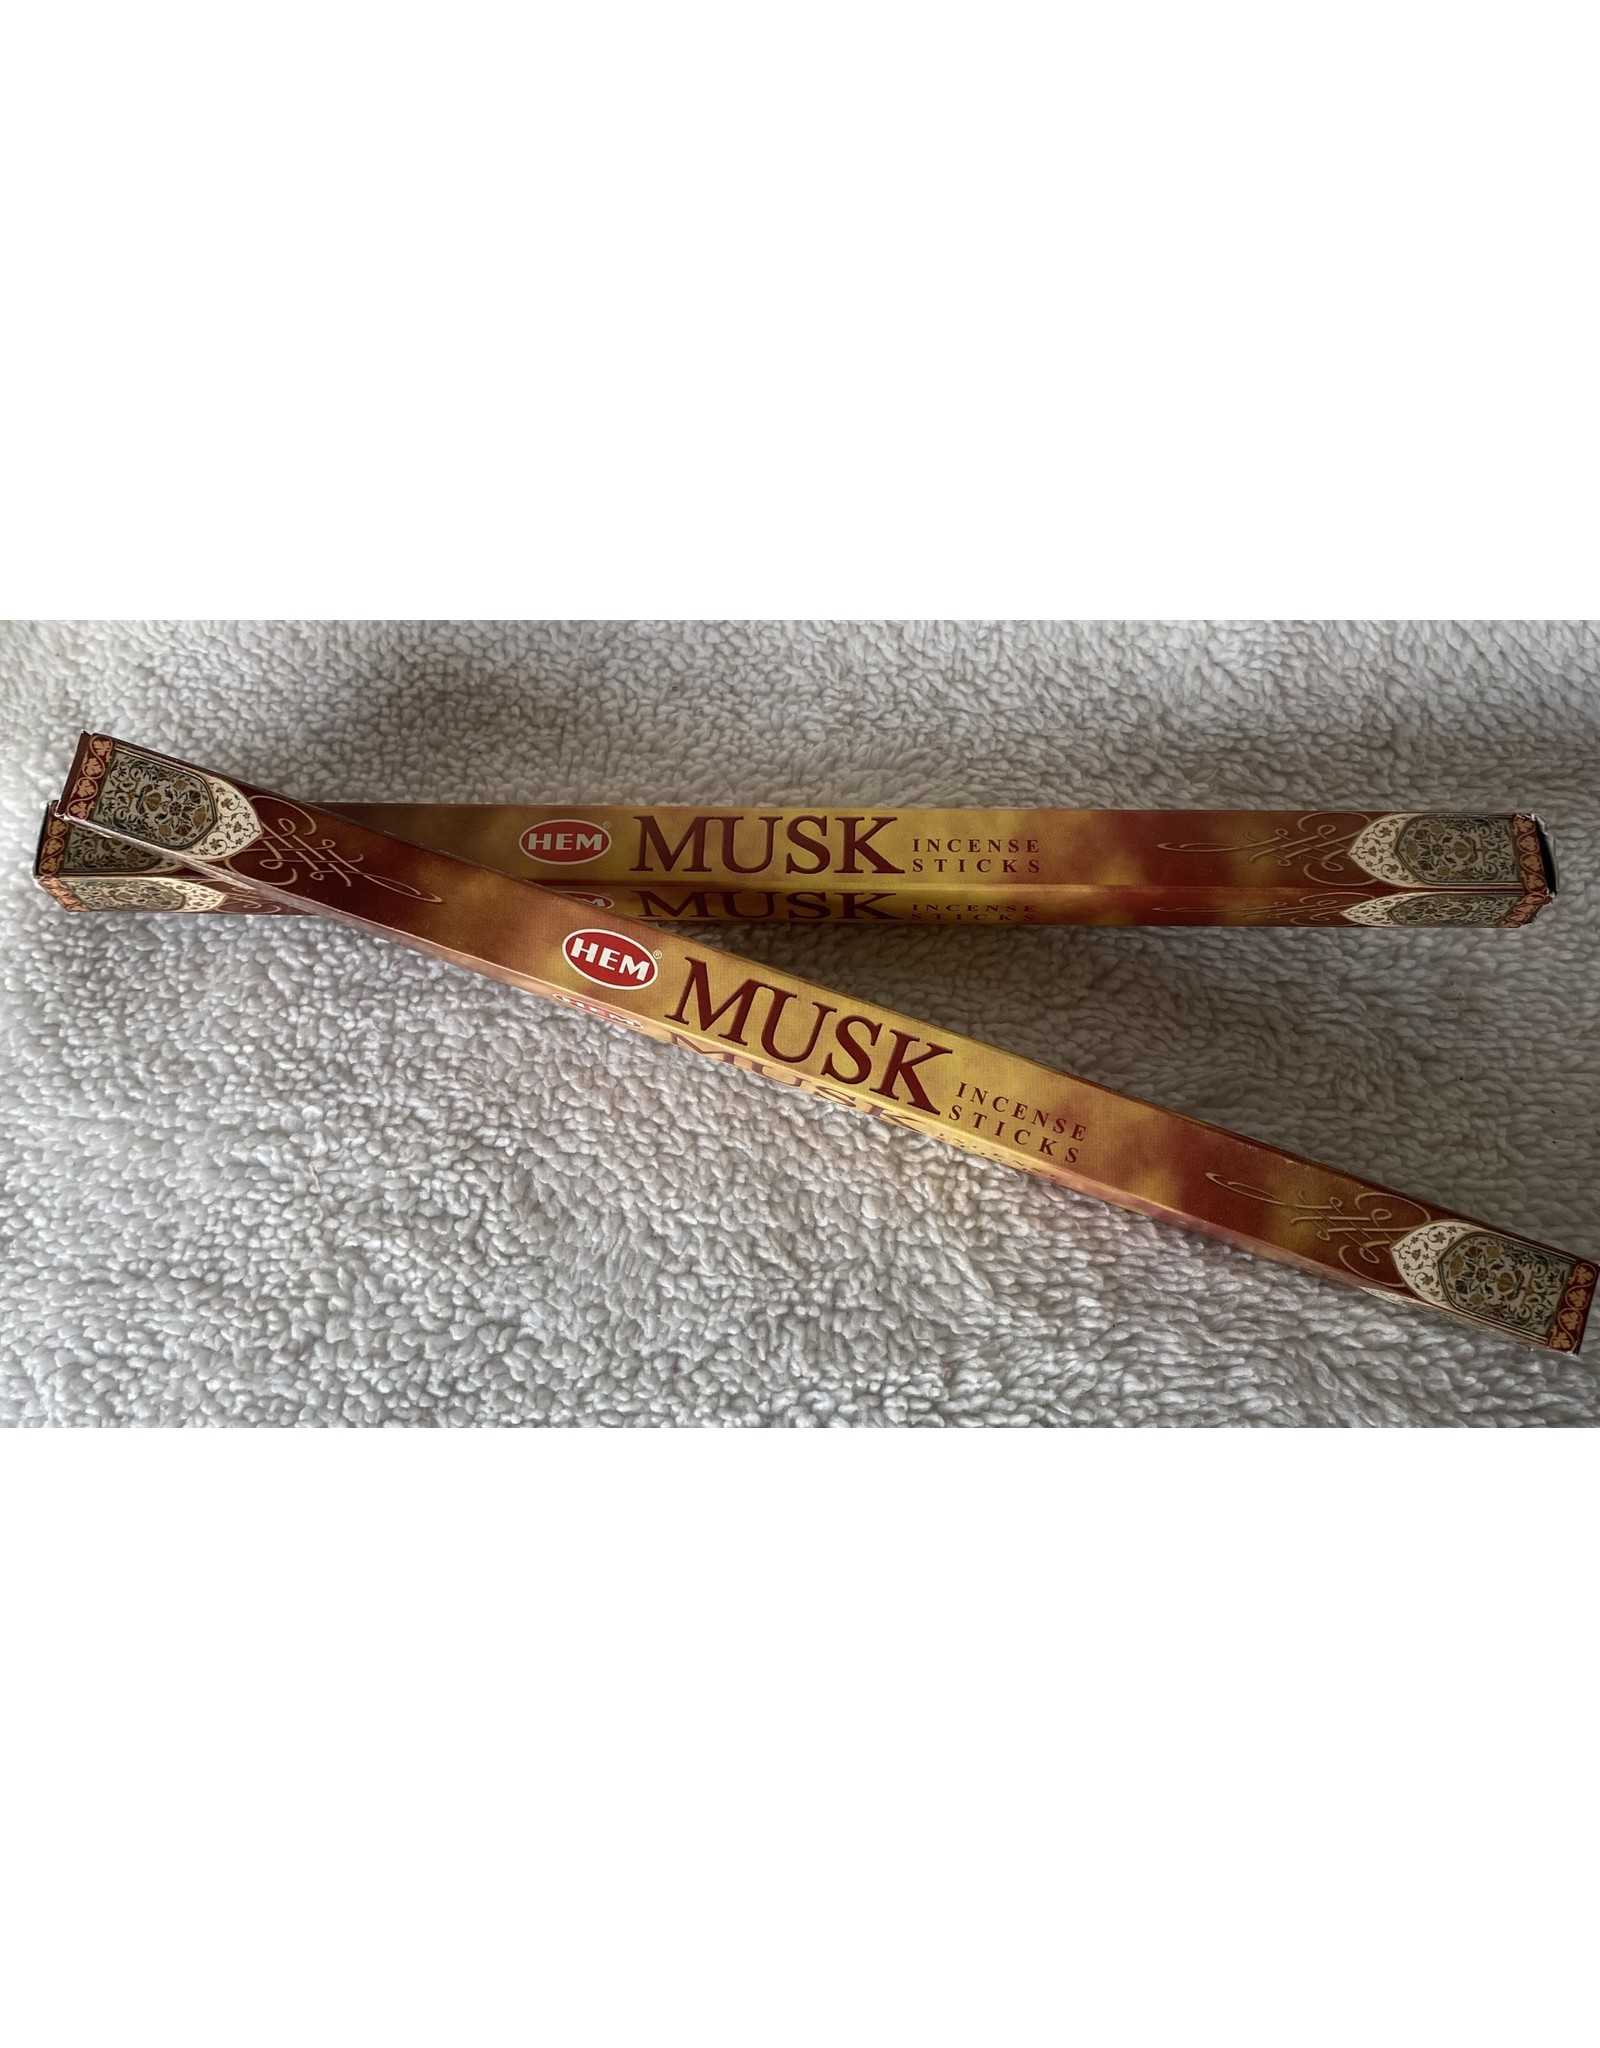 Hem Musk Incense